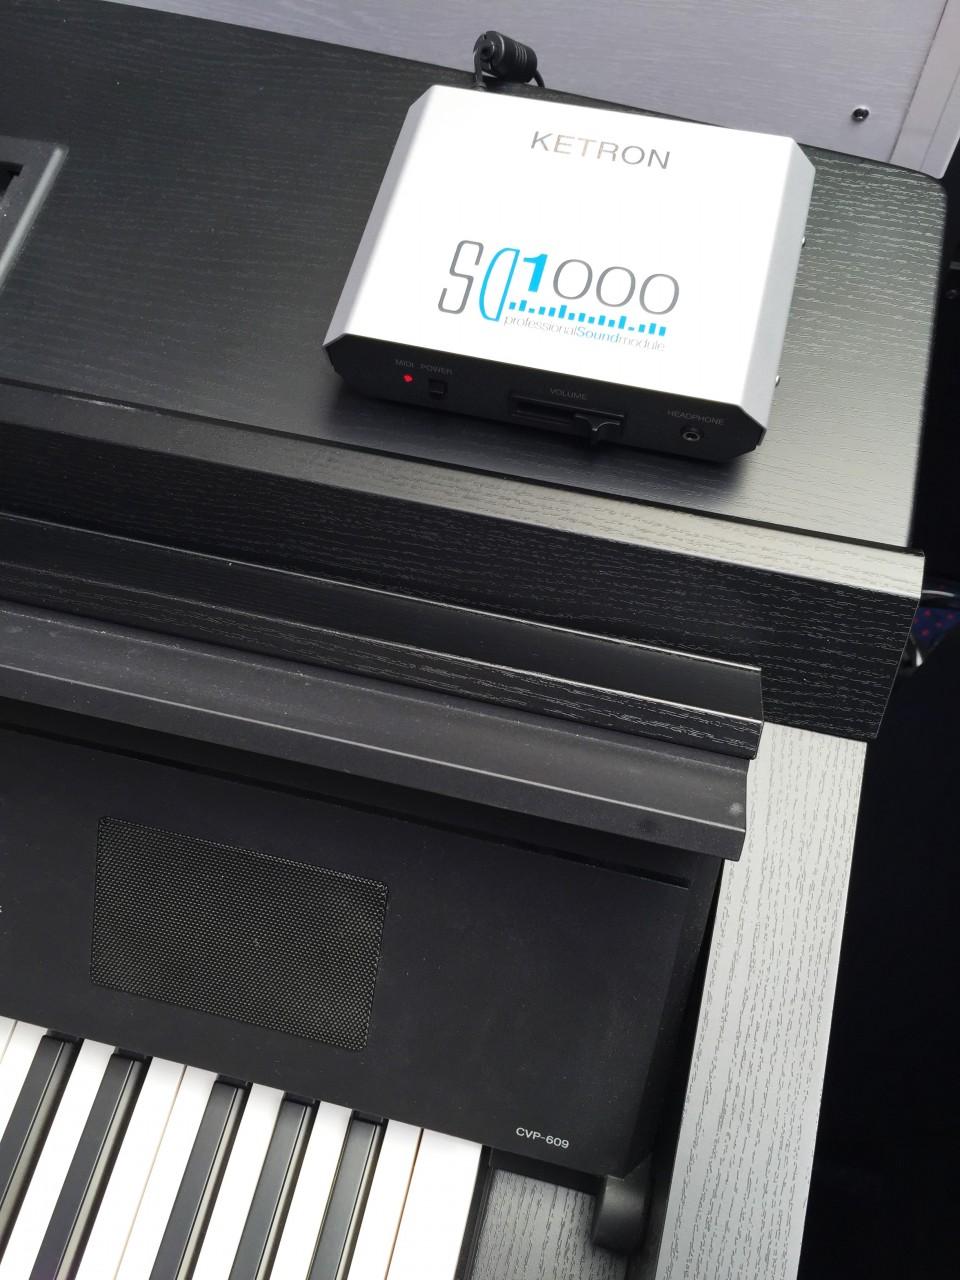 Ketron SD1000 incl. SoundPatch voor CVP-609